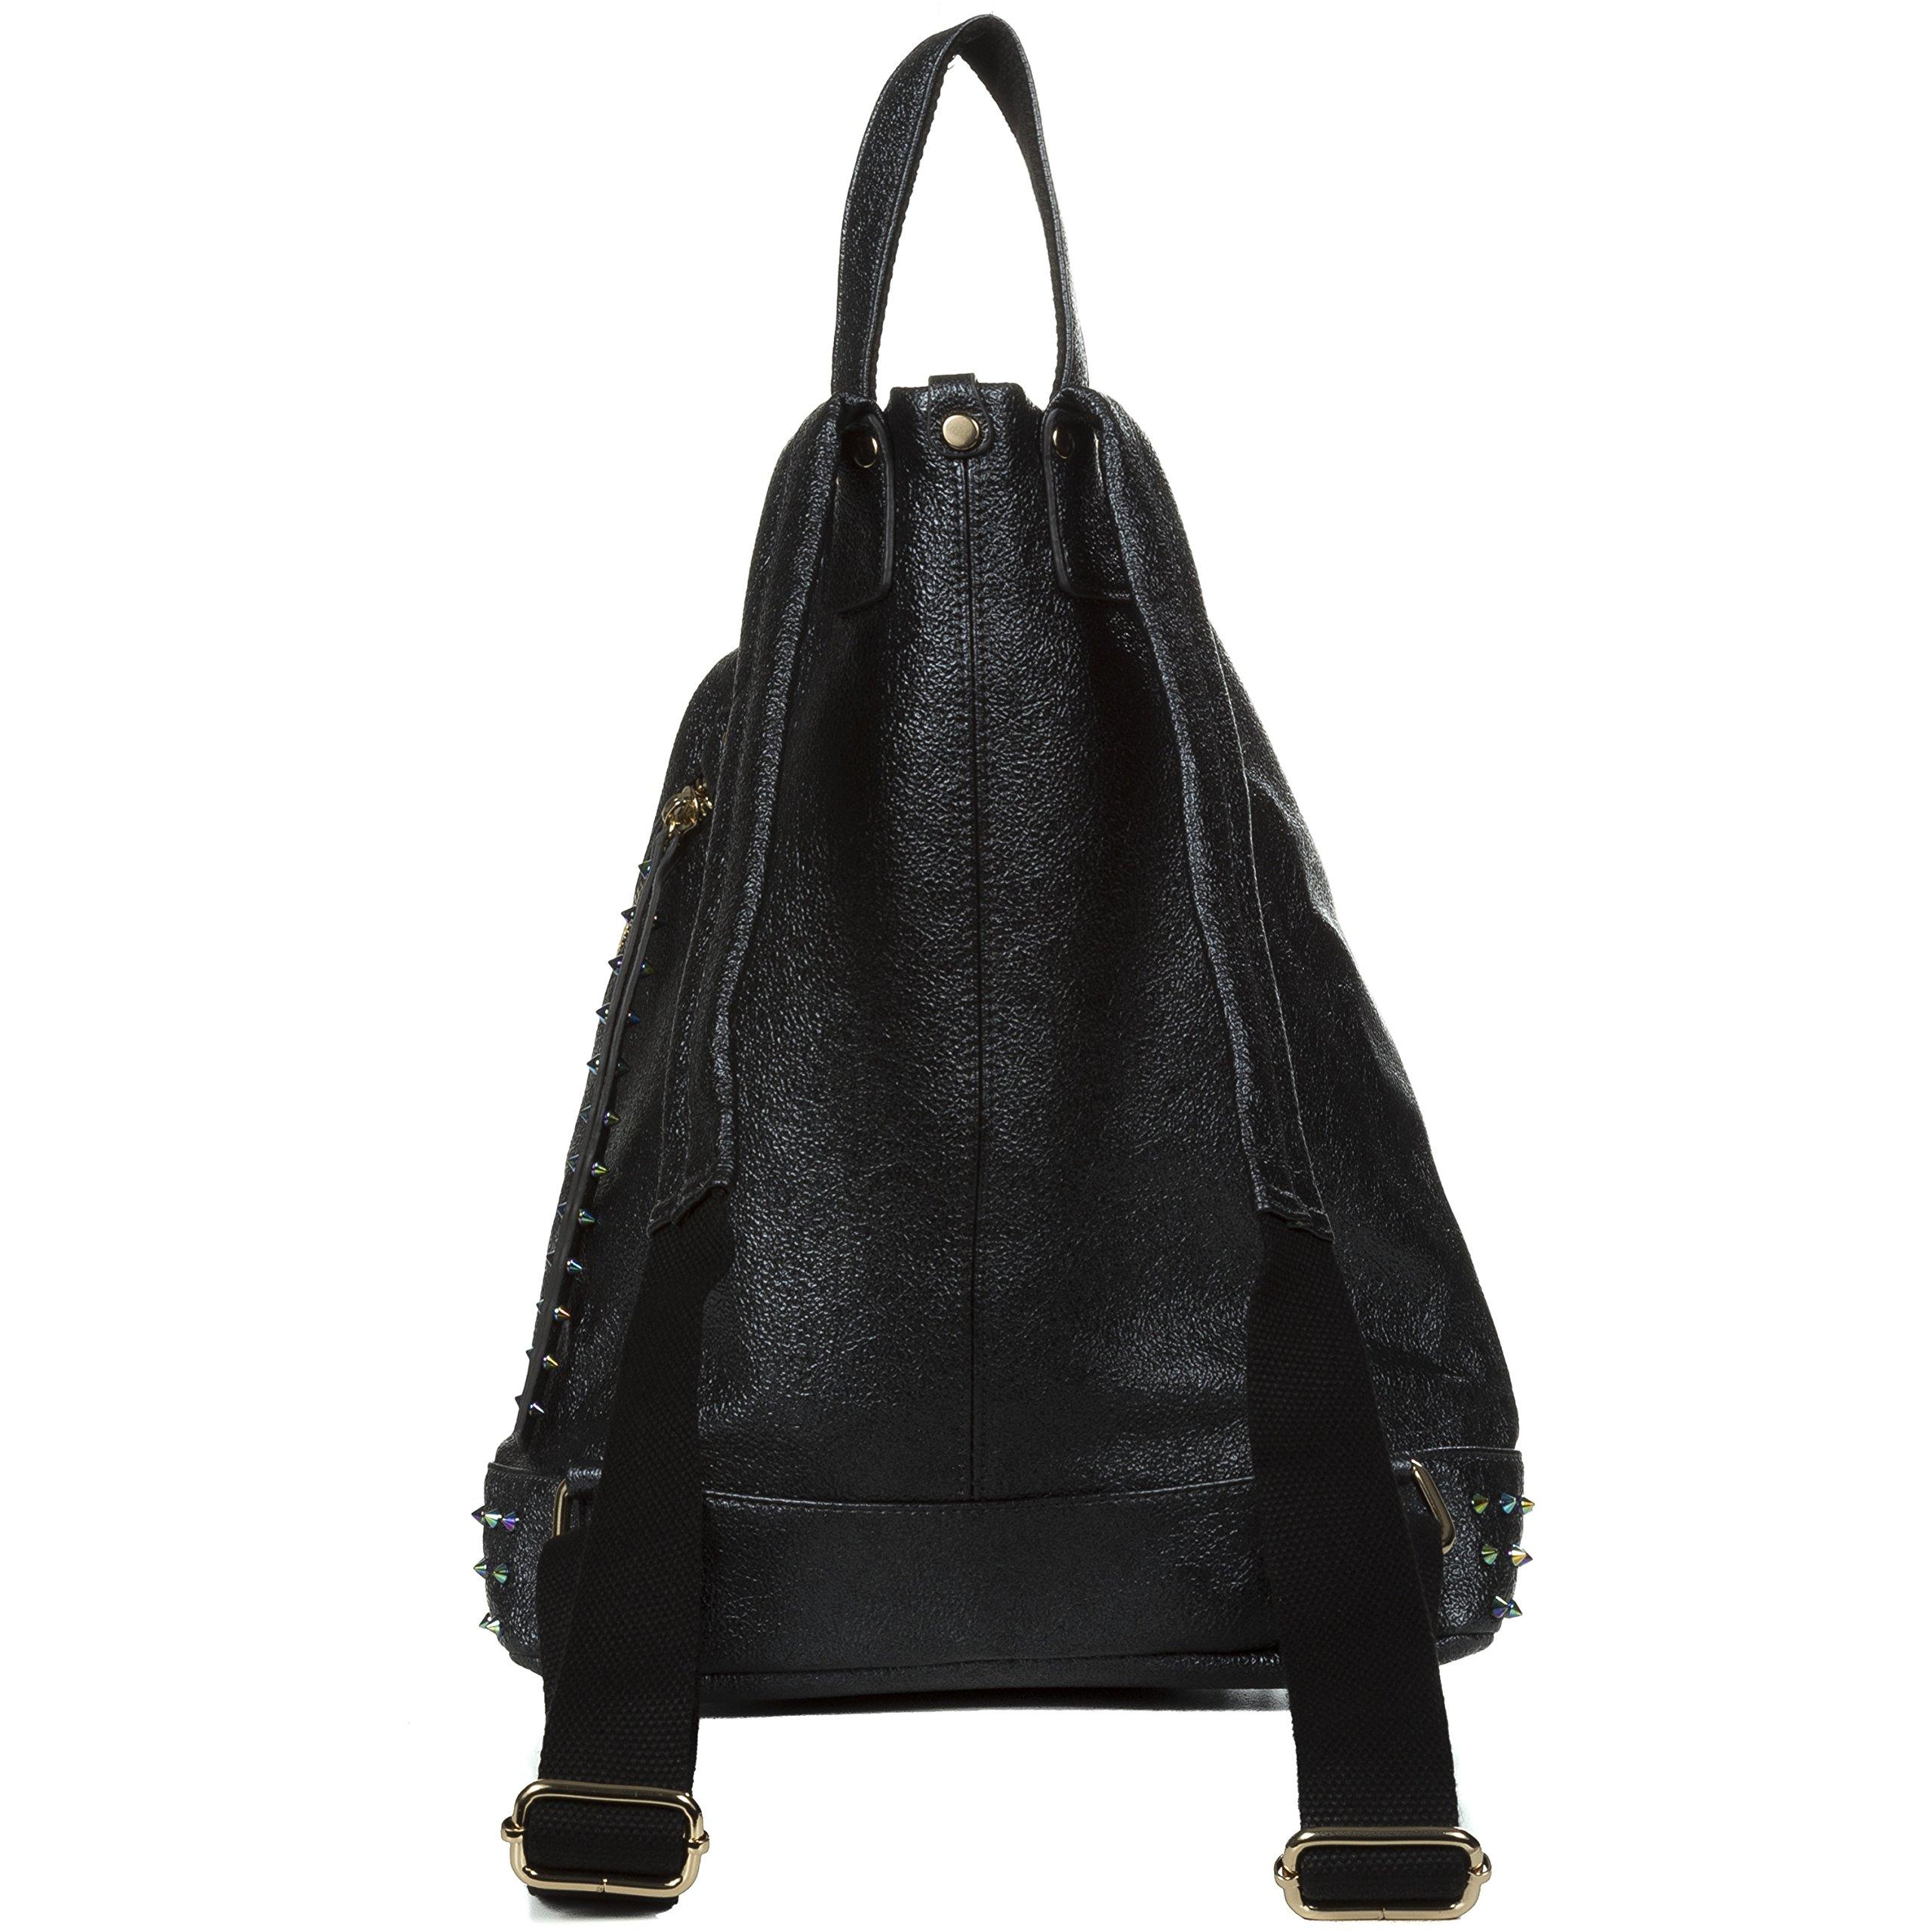 Handbag Republic Fashion Backpack Vegan Leather Travel Bag Easy Carry For Women by Handbag Republic (Image #4)